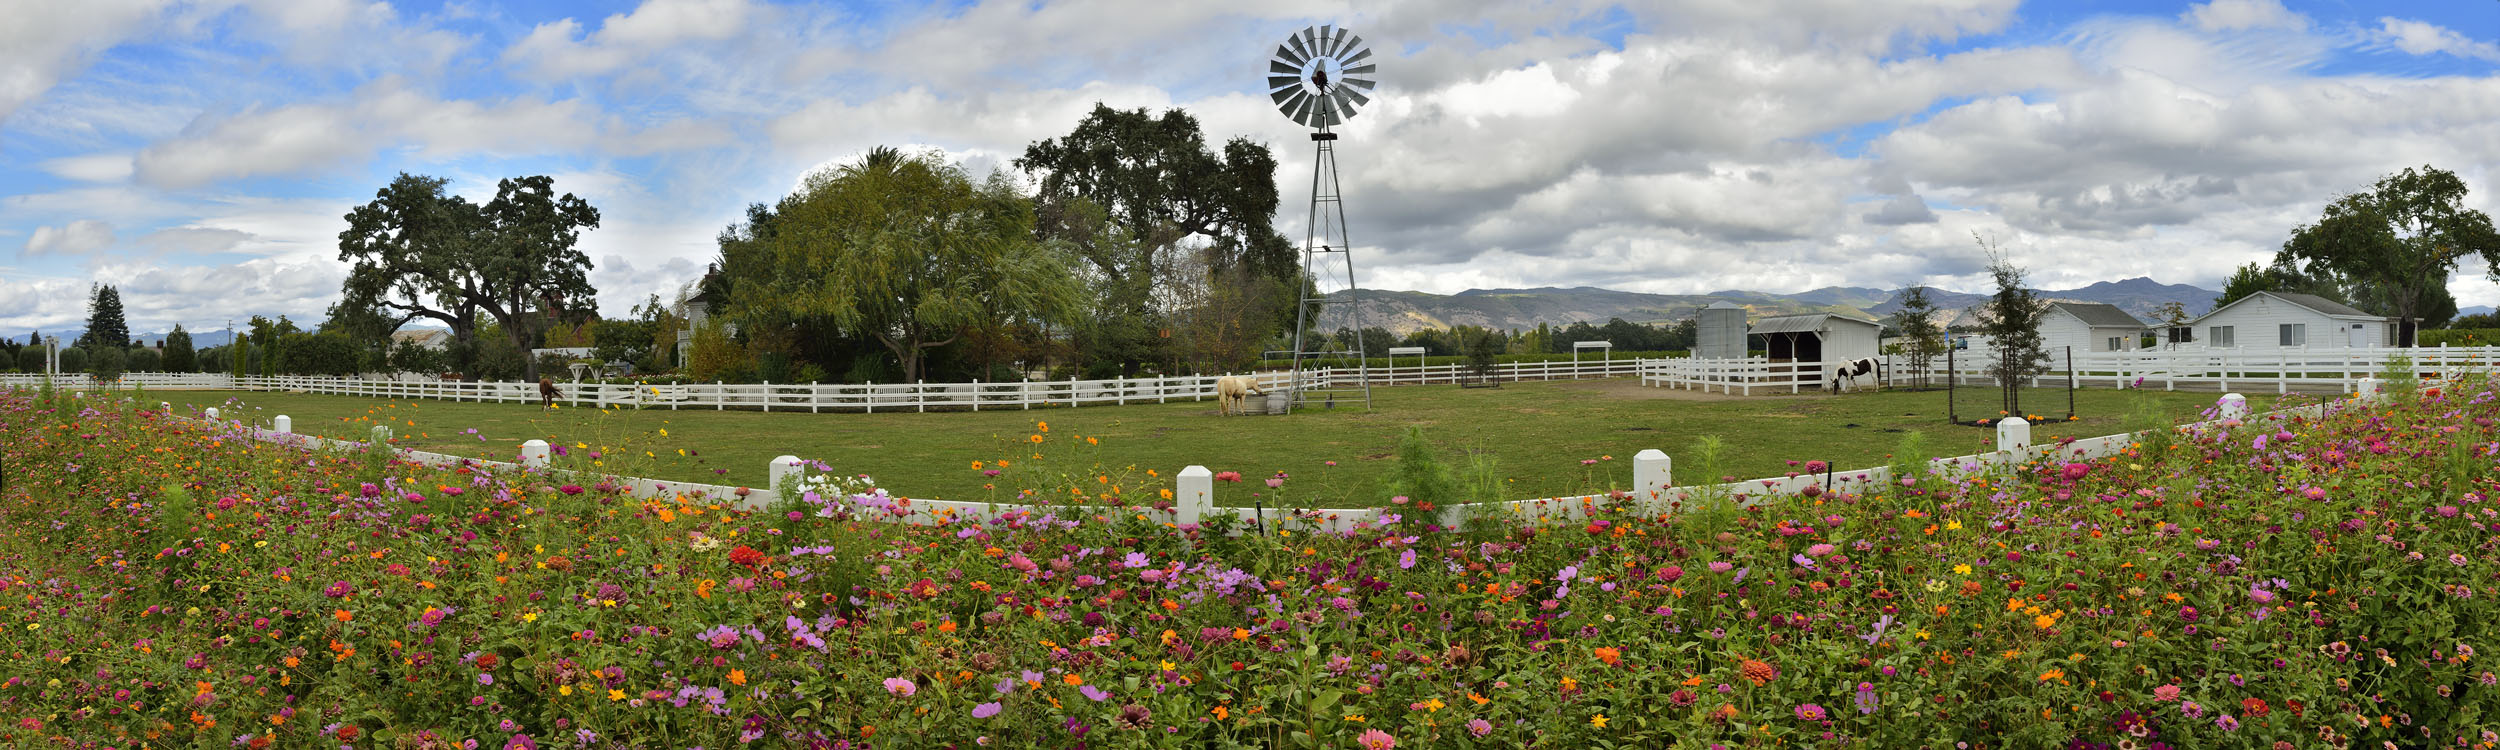 Horse Corral in Napa Valley